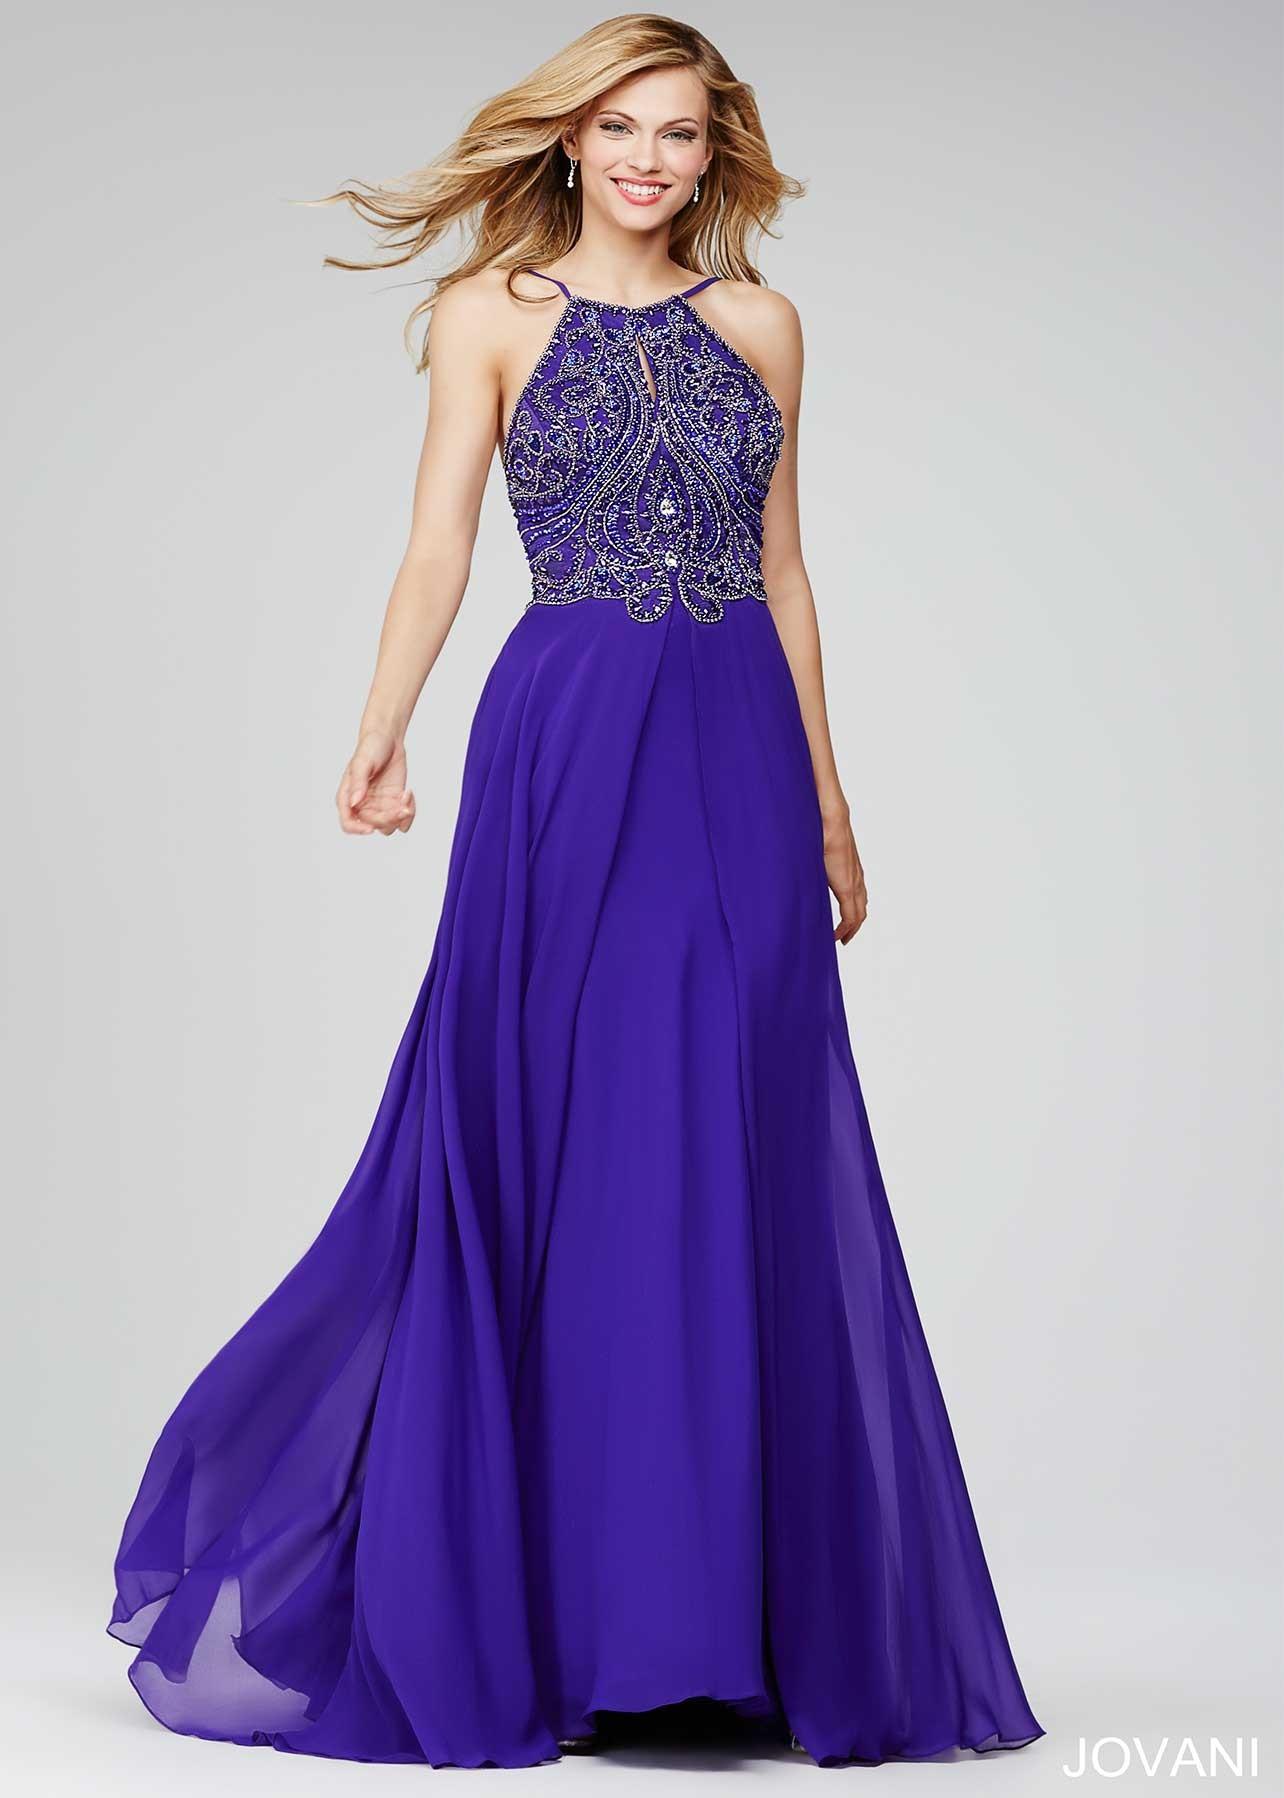 2600c90fda7 Jovani Halter Dress Formal - Gomes Weine AG